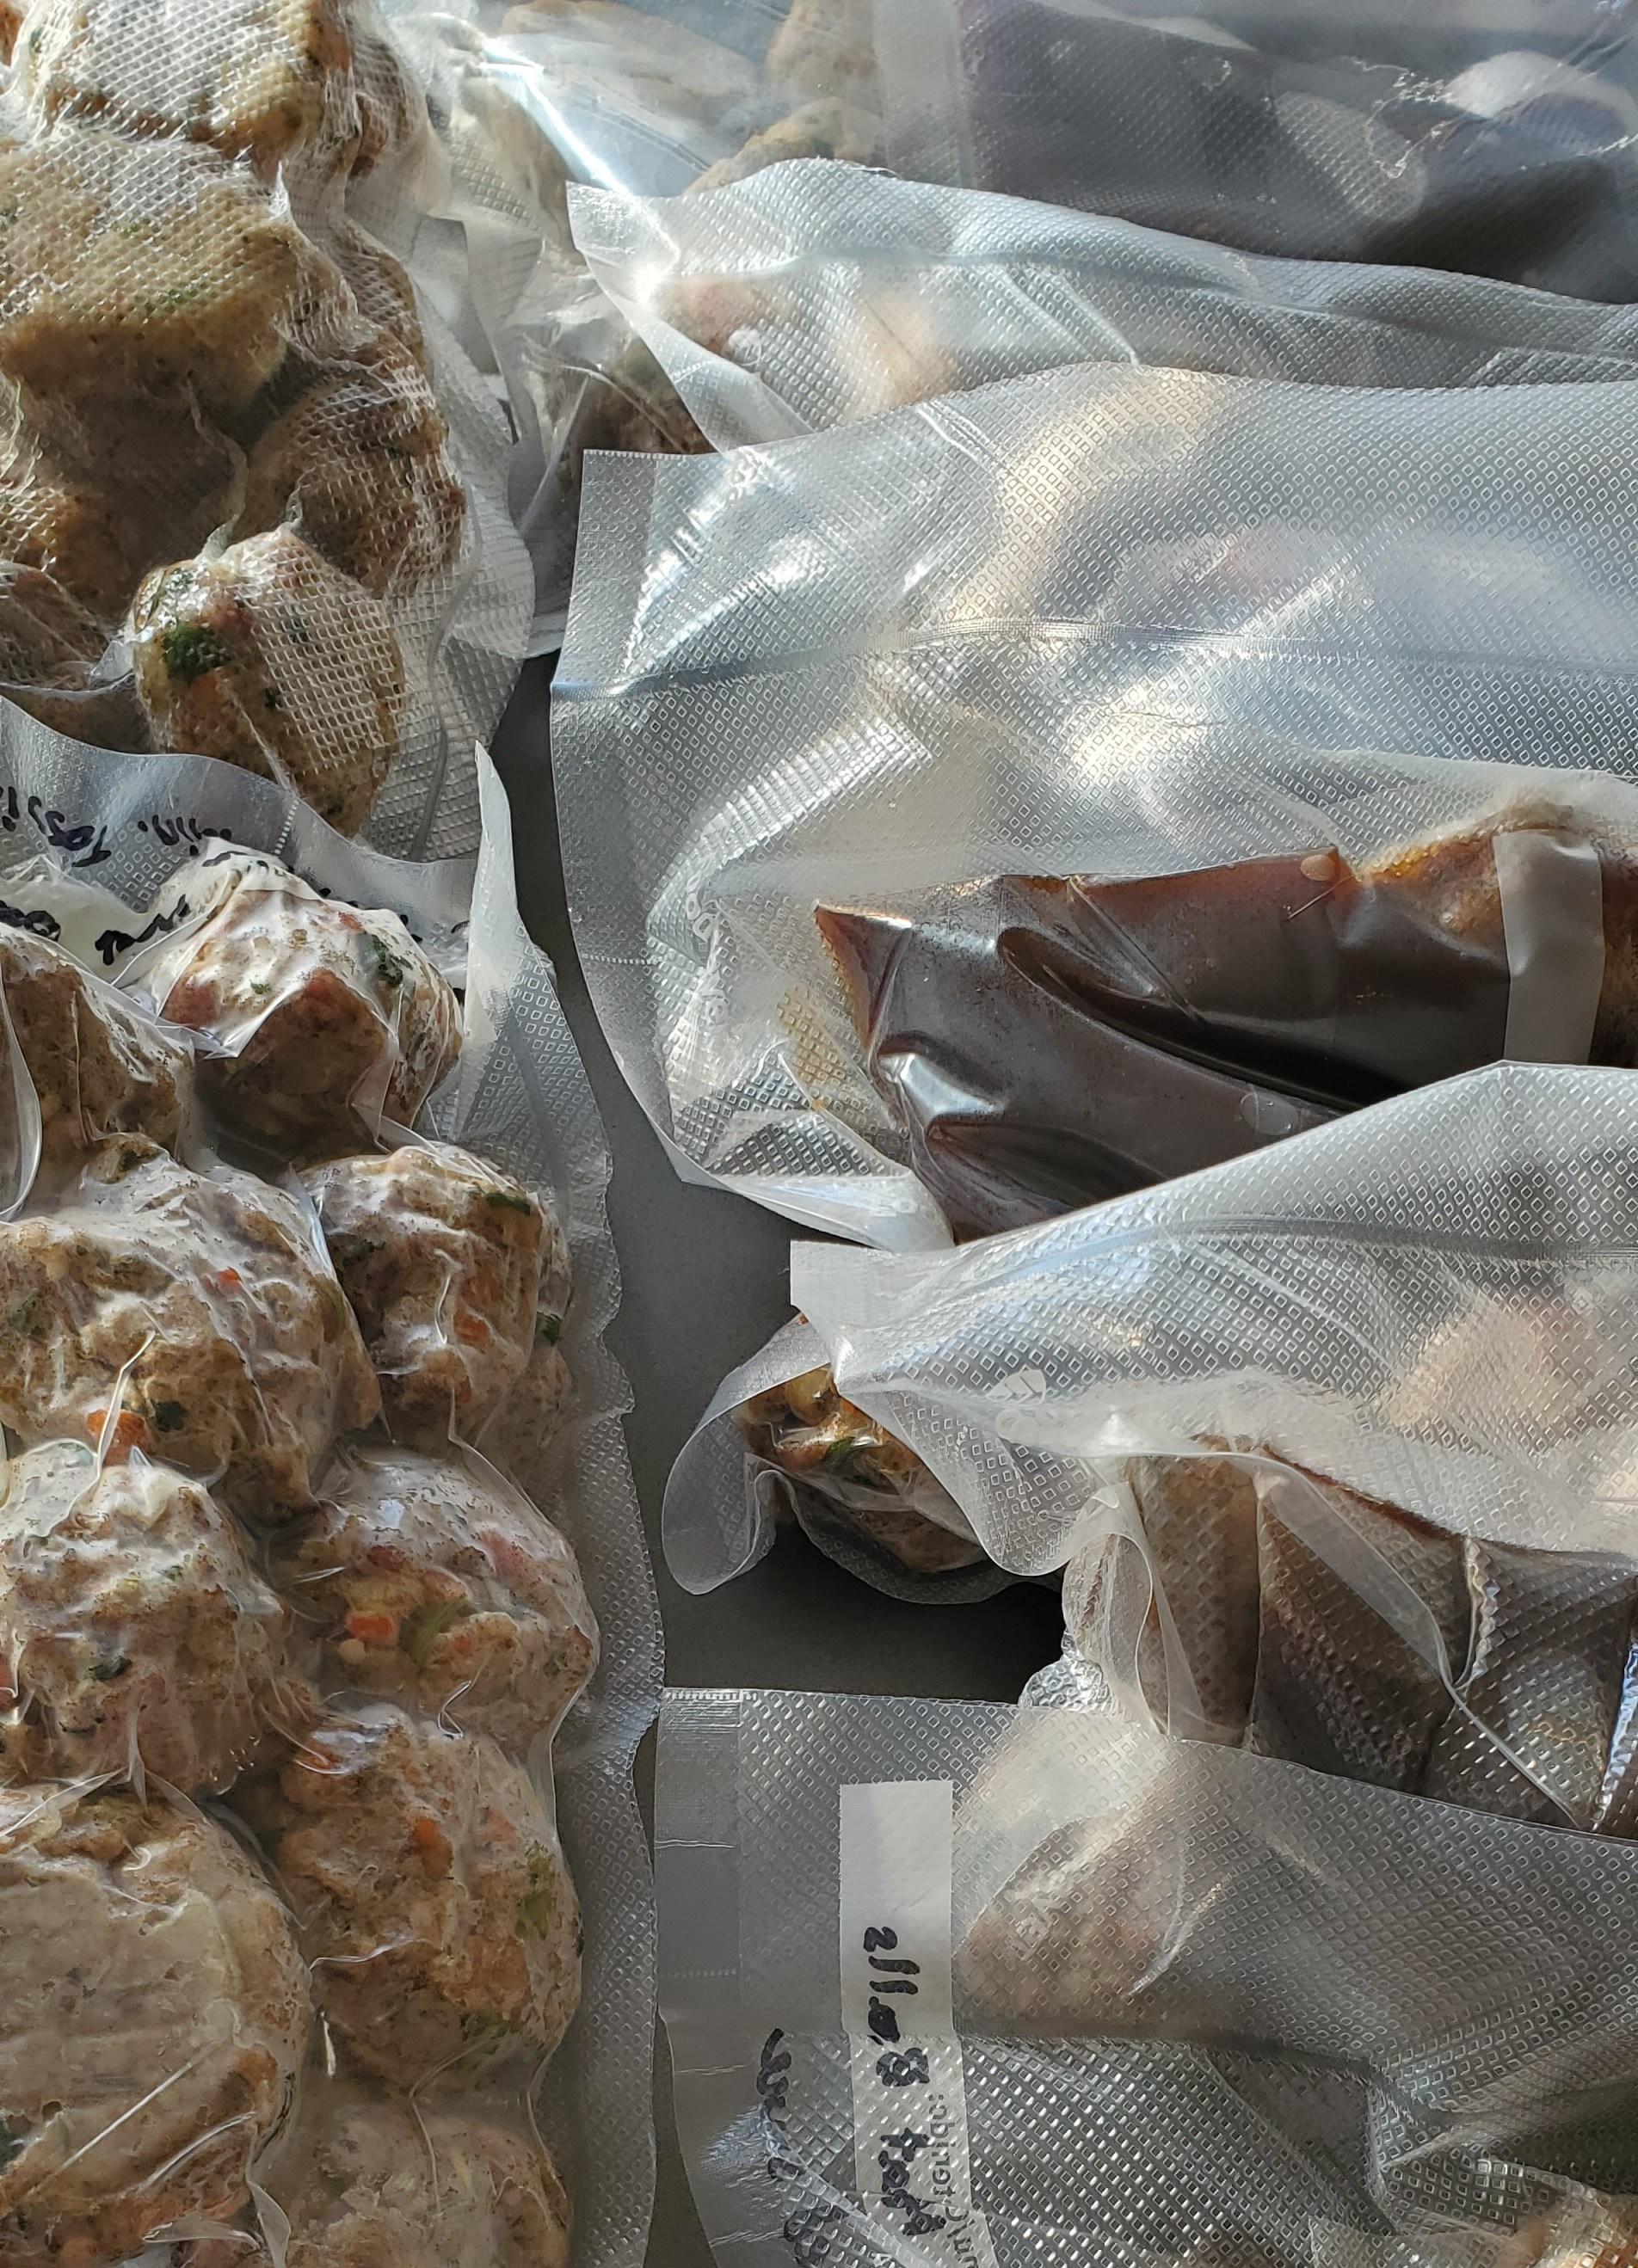 Vacuum packed packages of meatballs